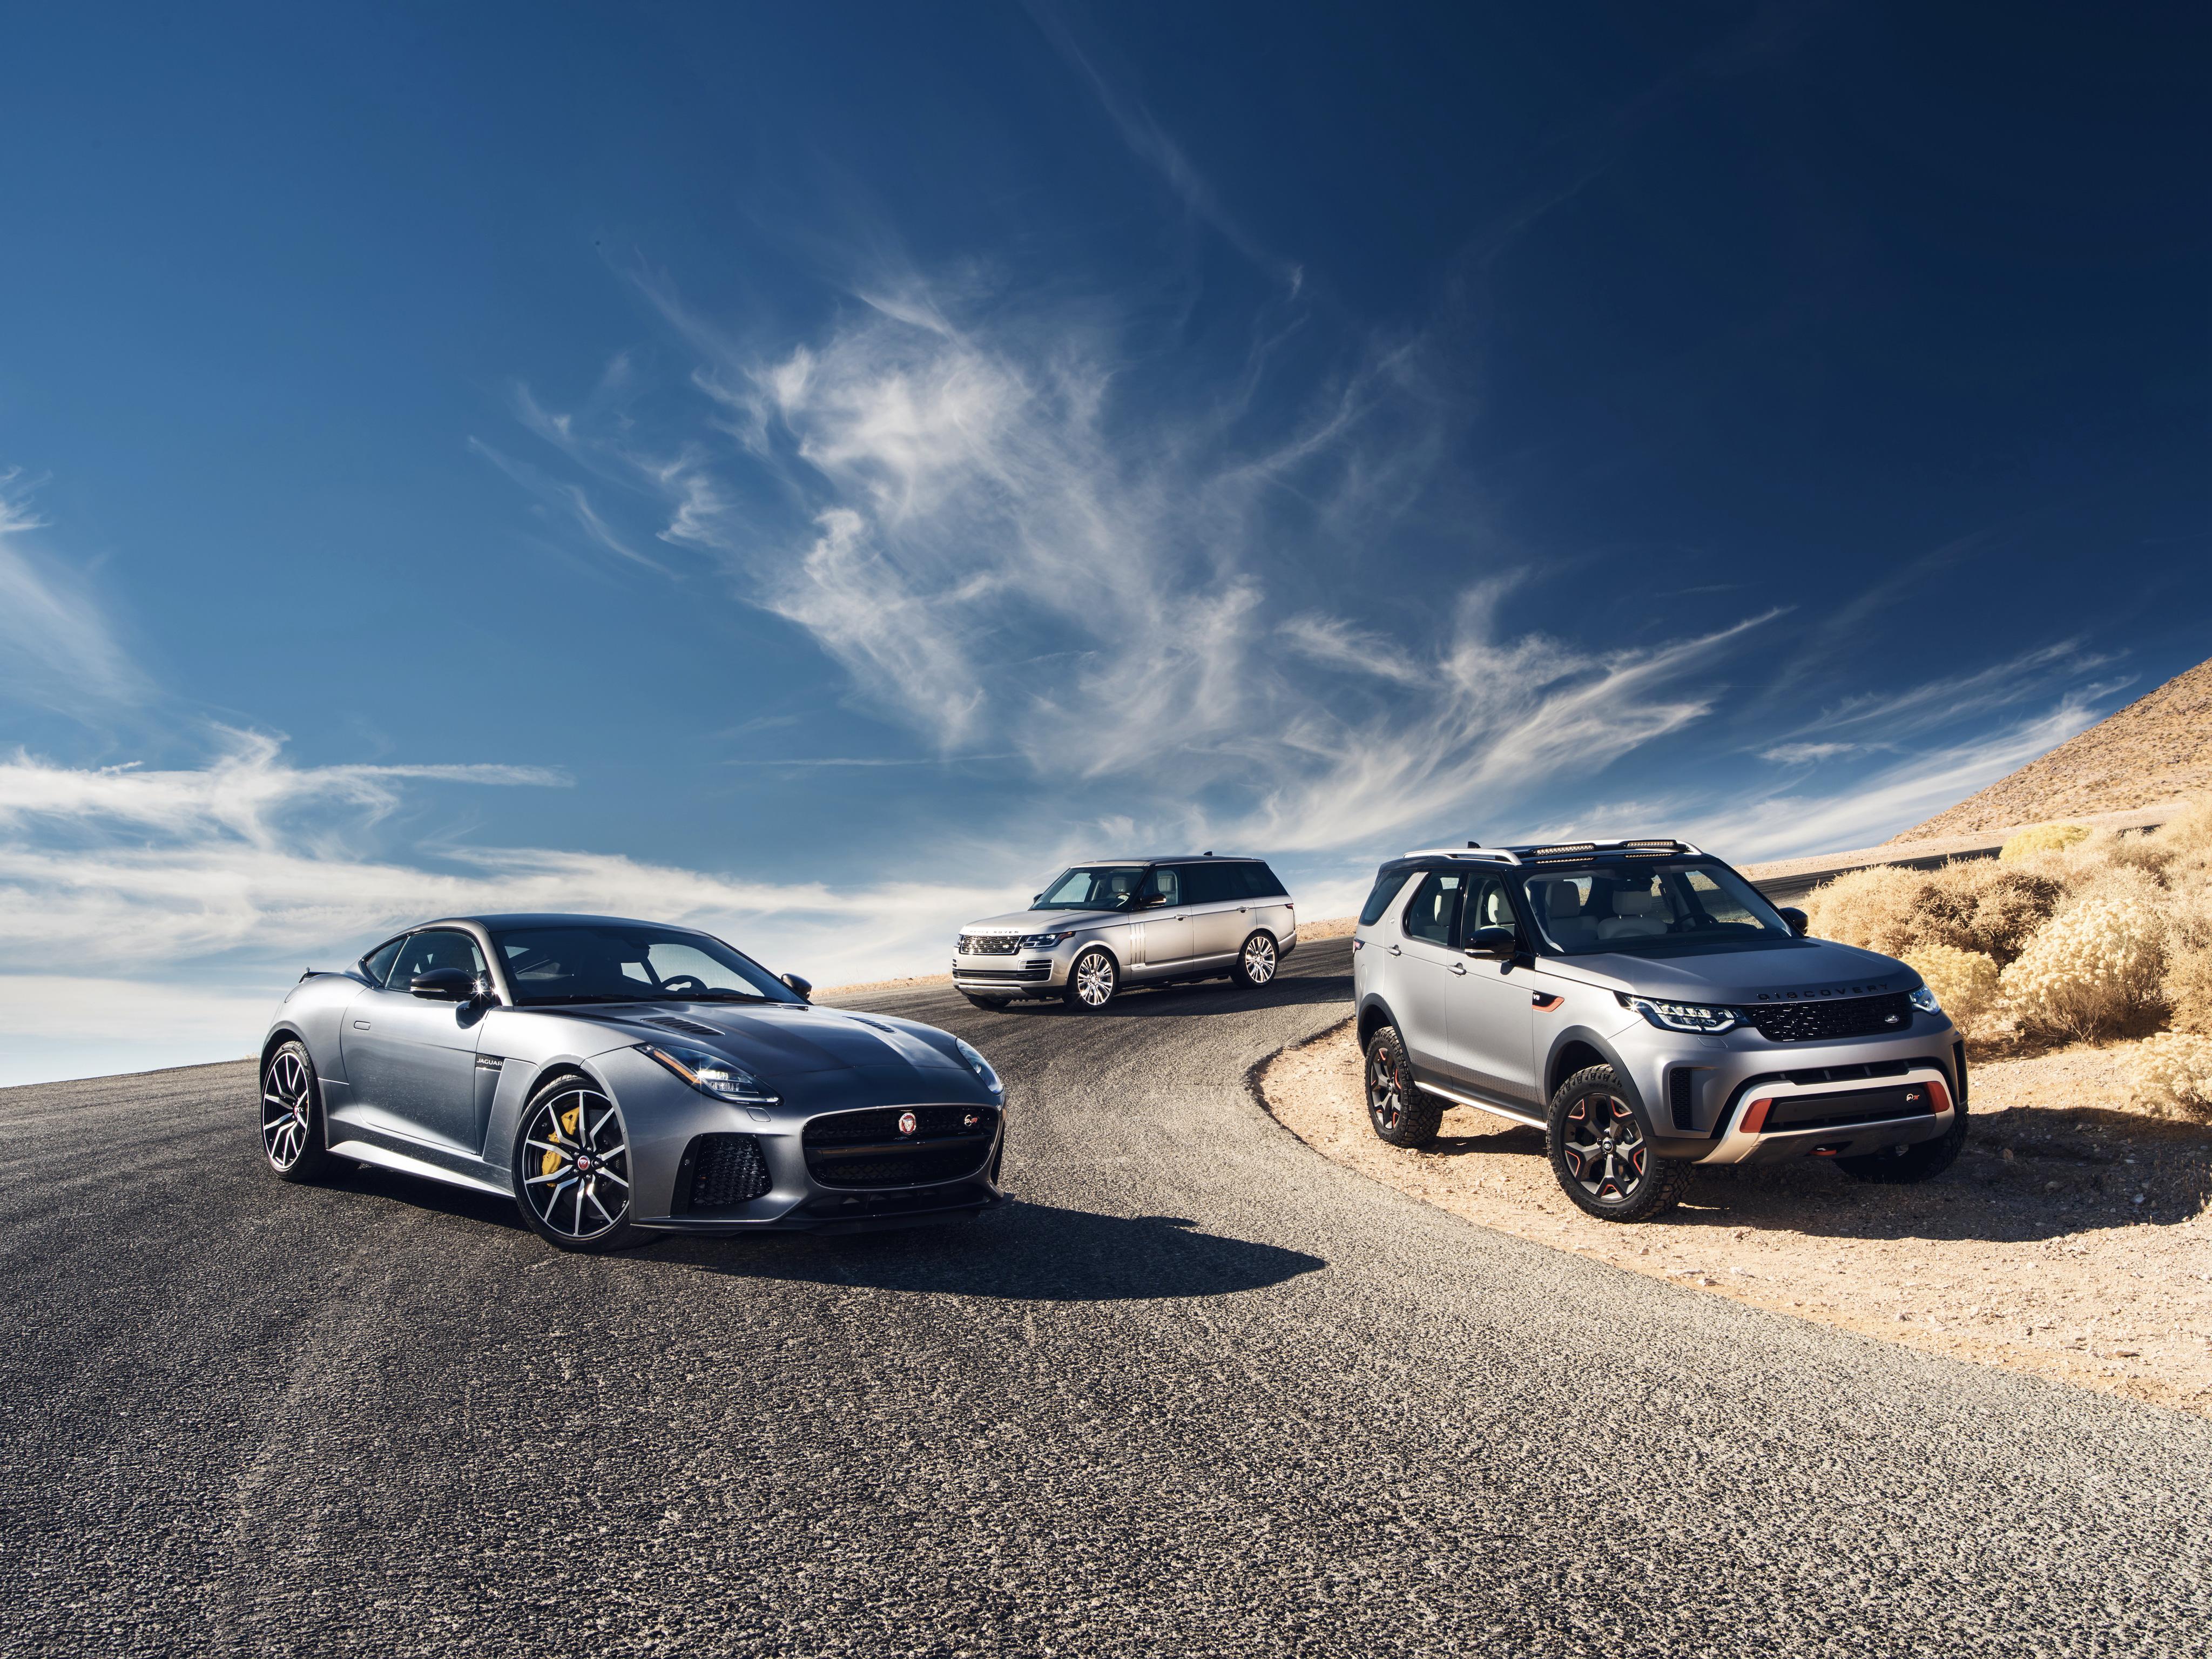 Jaguar Land Rover Range Rover 4k, HD Cars, 4k Wallpapers